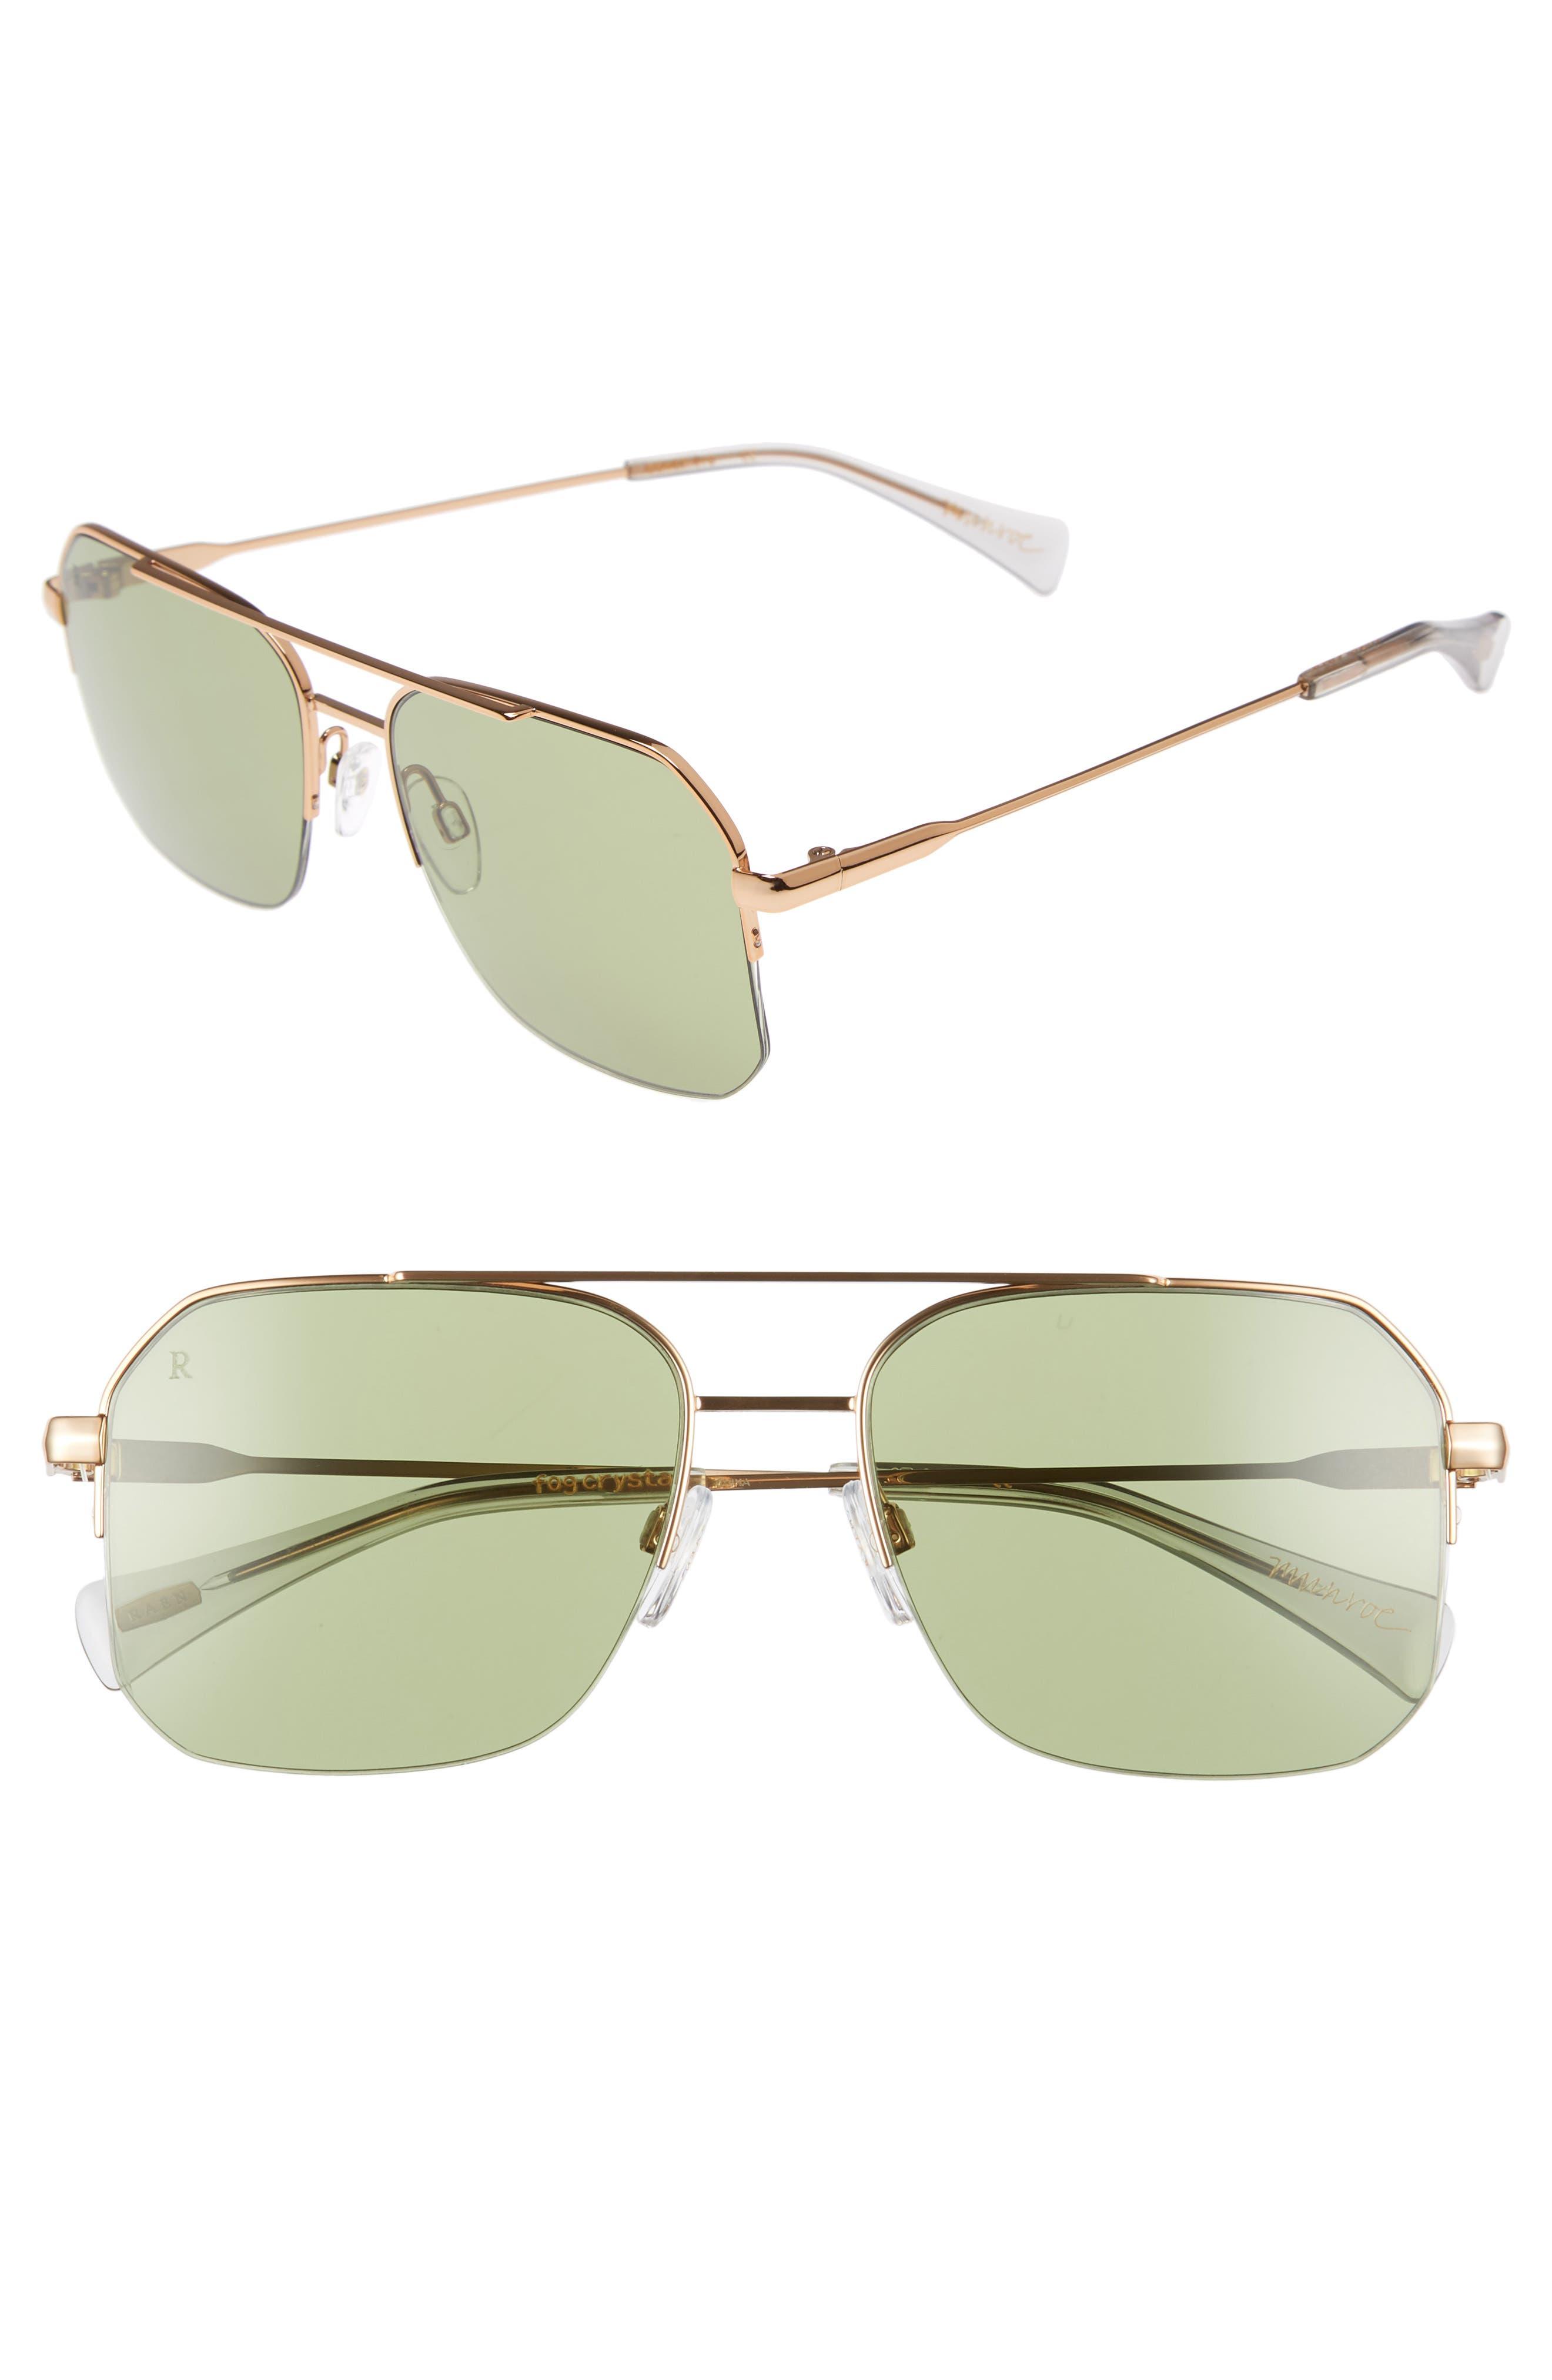 RAEN Munroe 55Mm Square Aviator Sunglasses - Fog Crystal